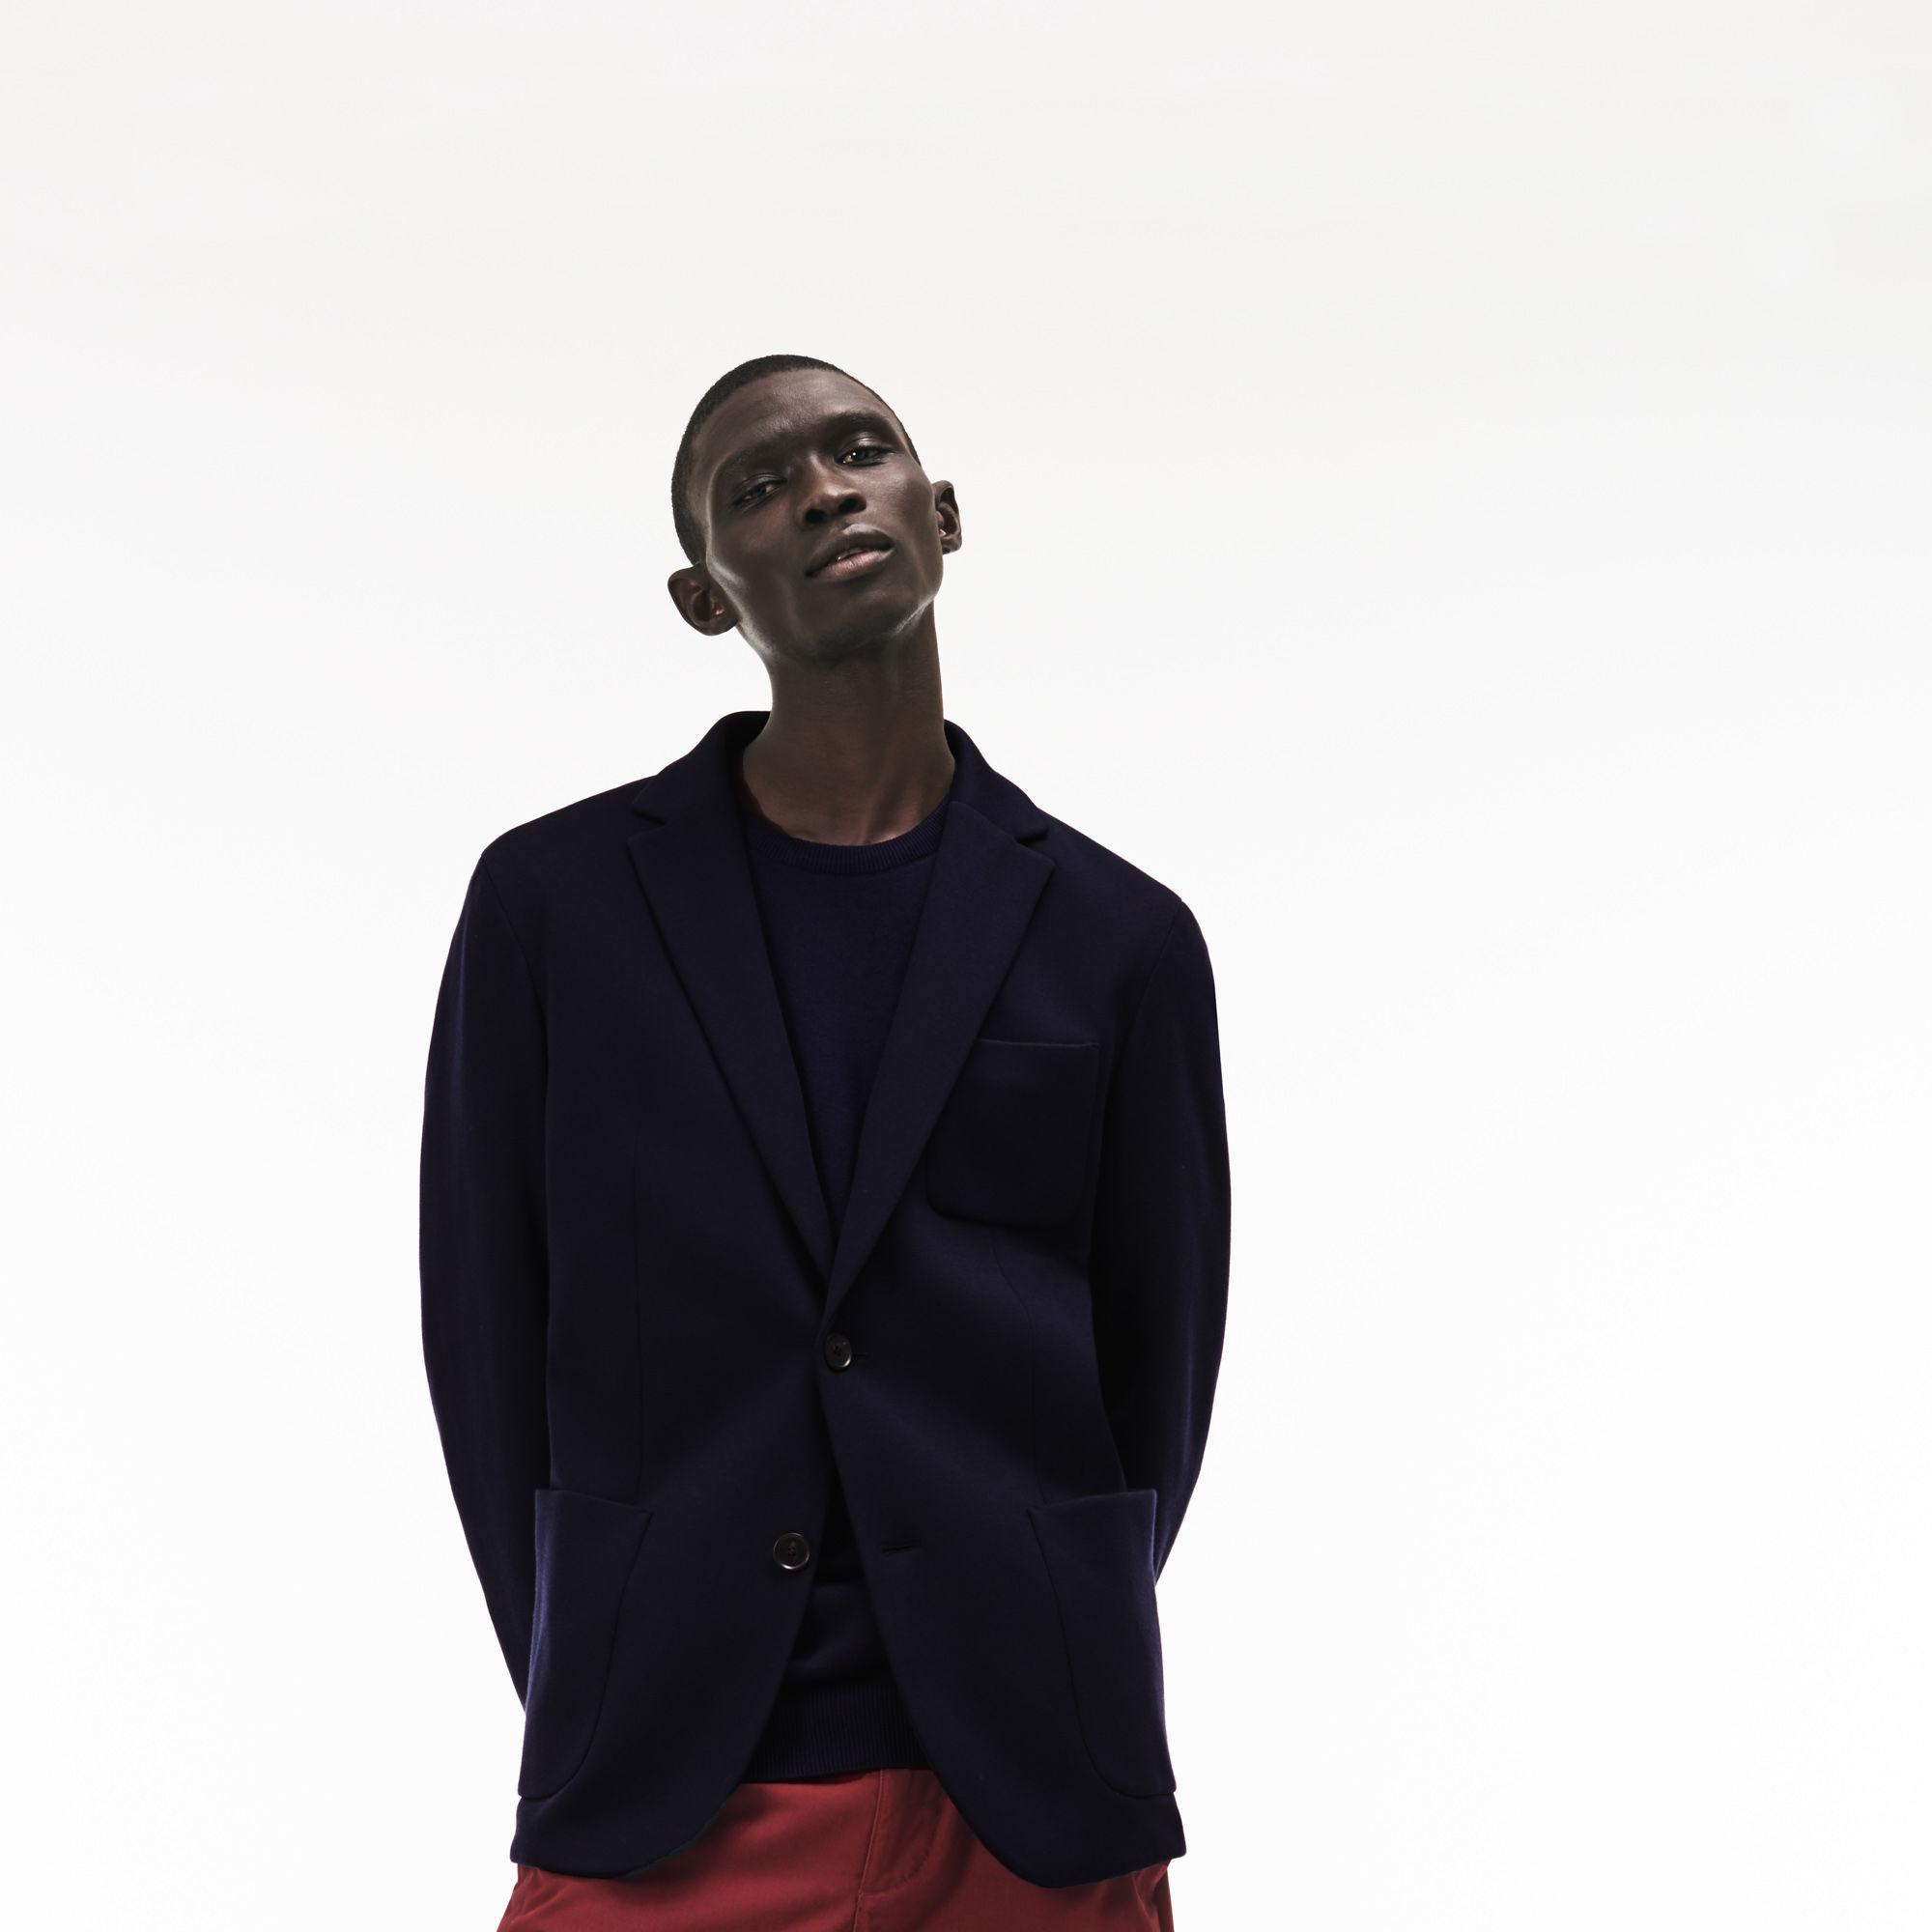 b693e1470b120 Lyst - Lacoste Stretch Cotton Jersey Piqué Blazer in Blue for Men